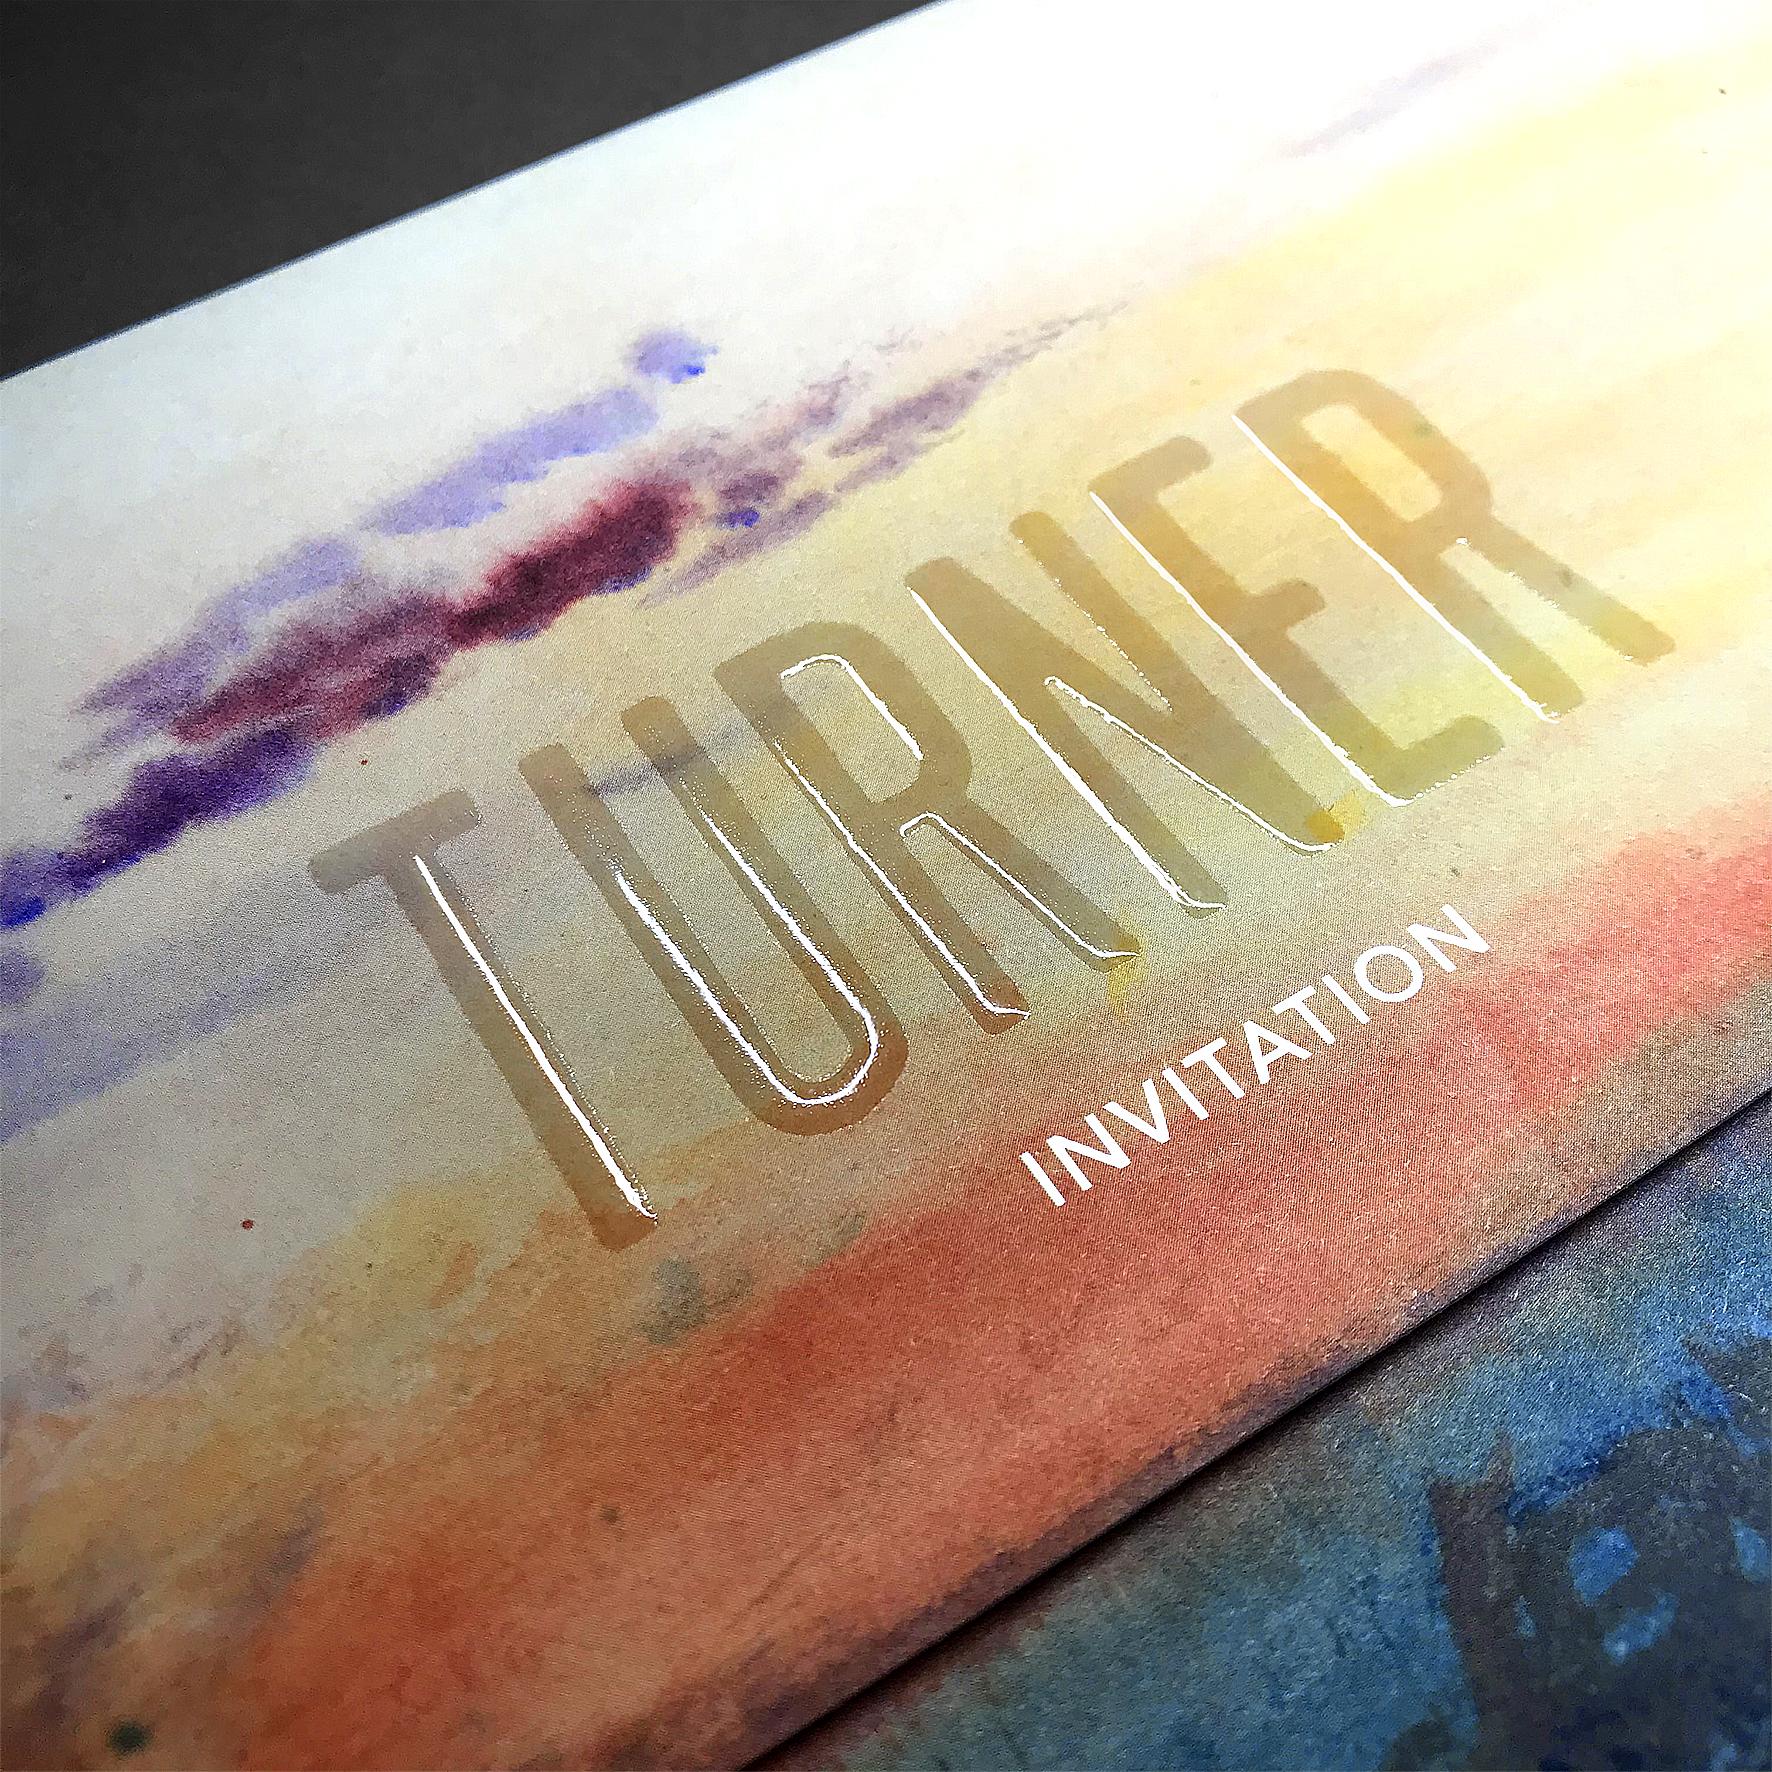 Turner Vernis